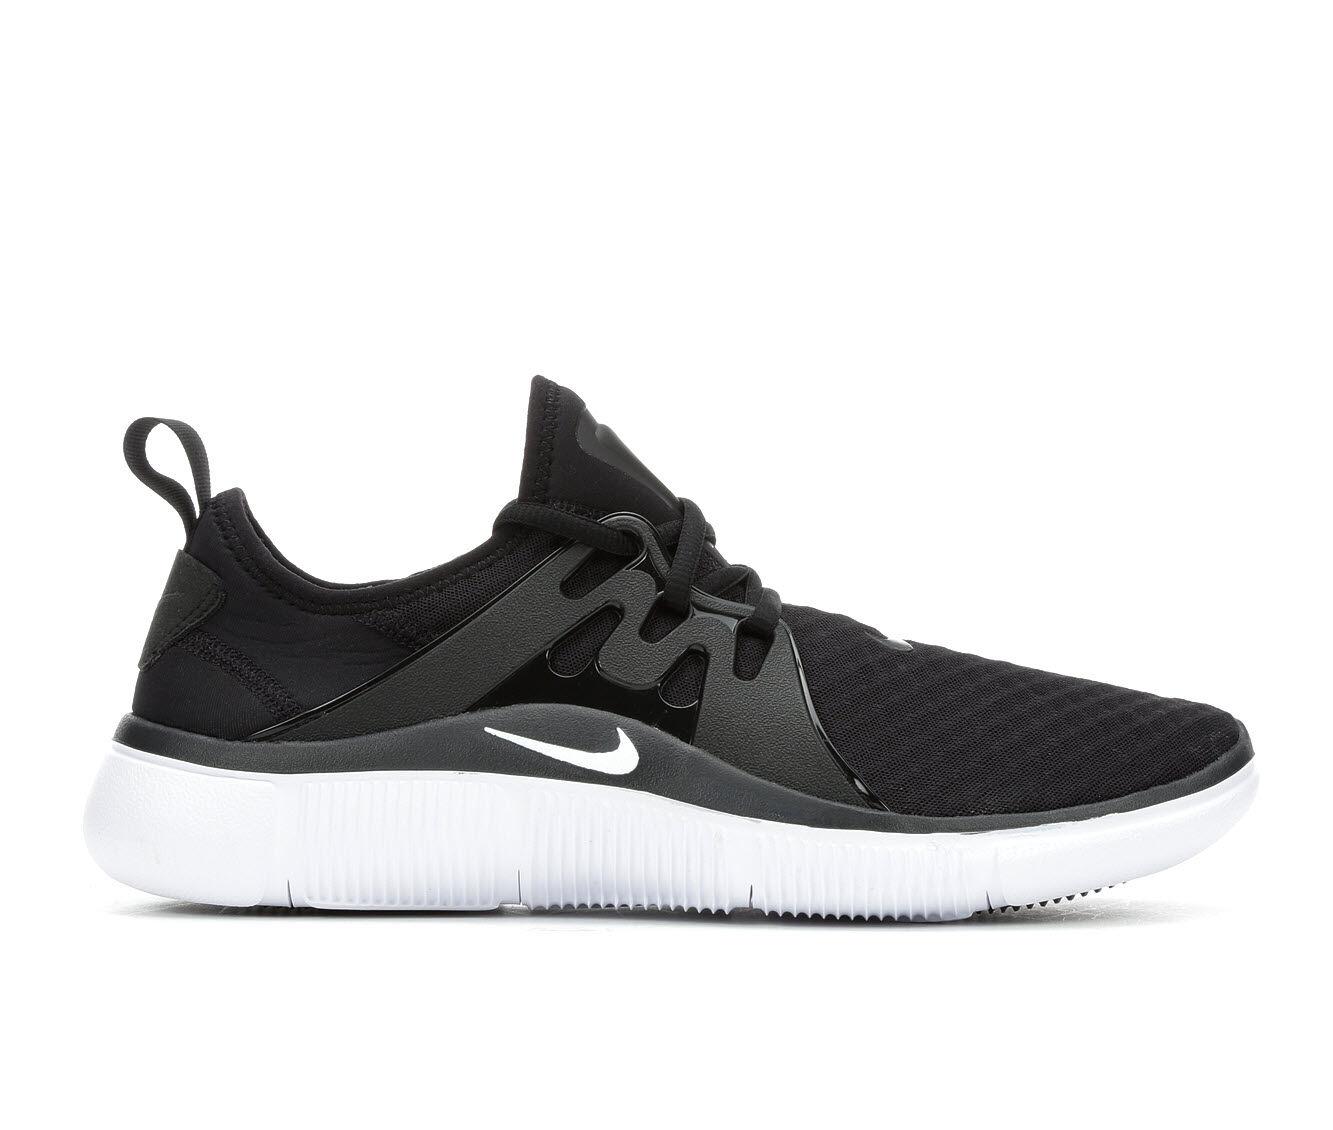 Men's Nike Acalme Sneakers Black/White